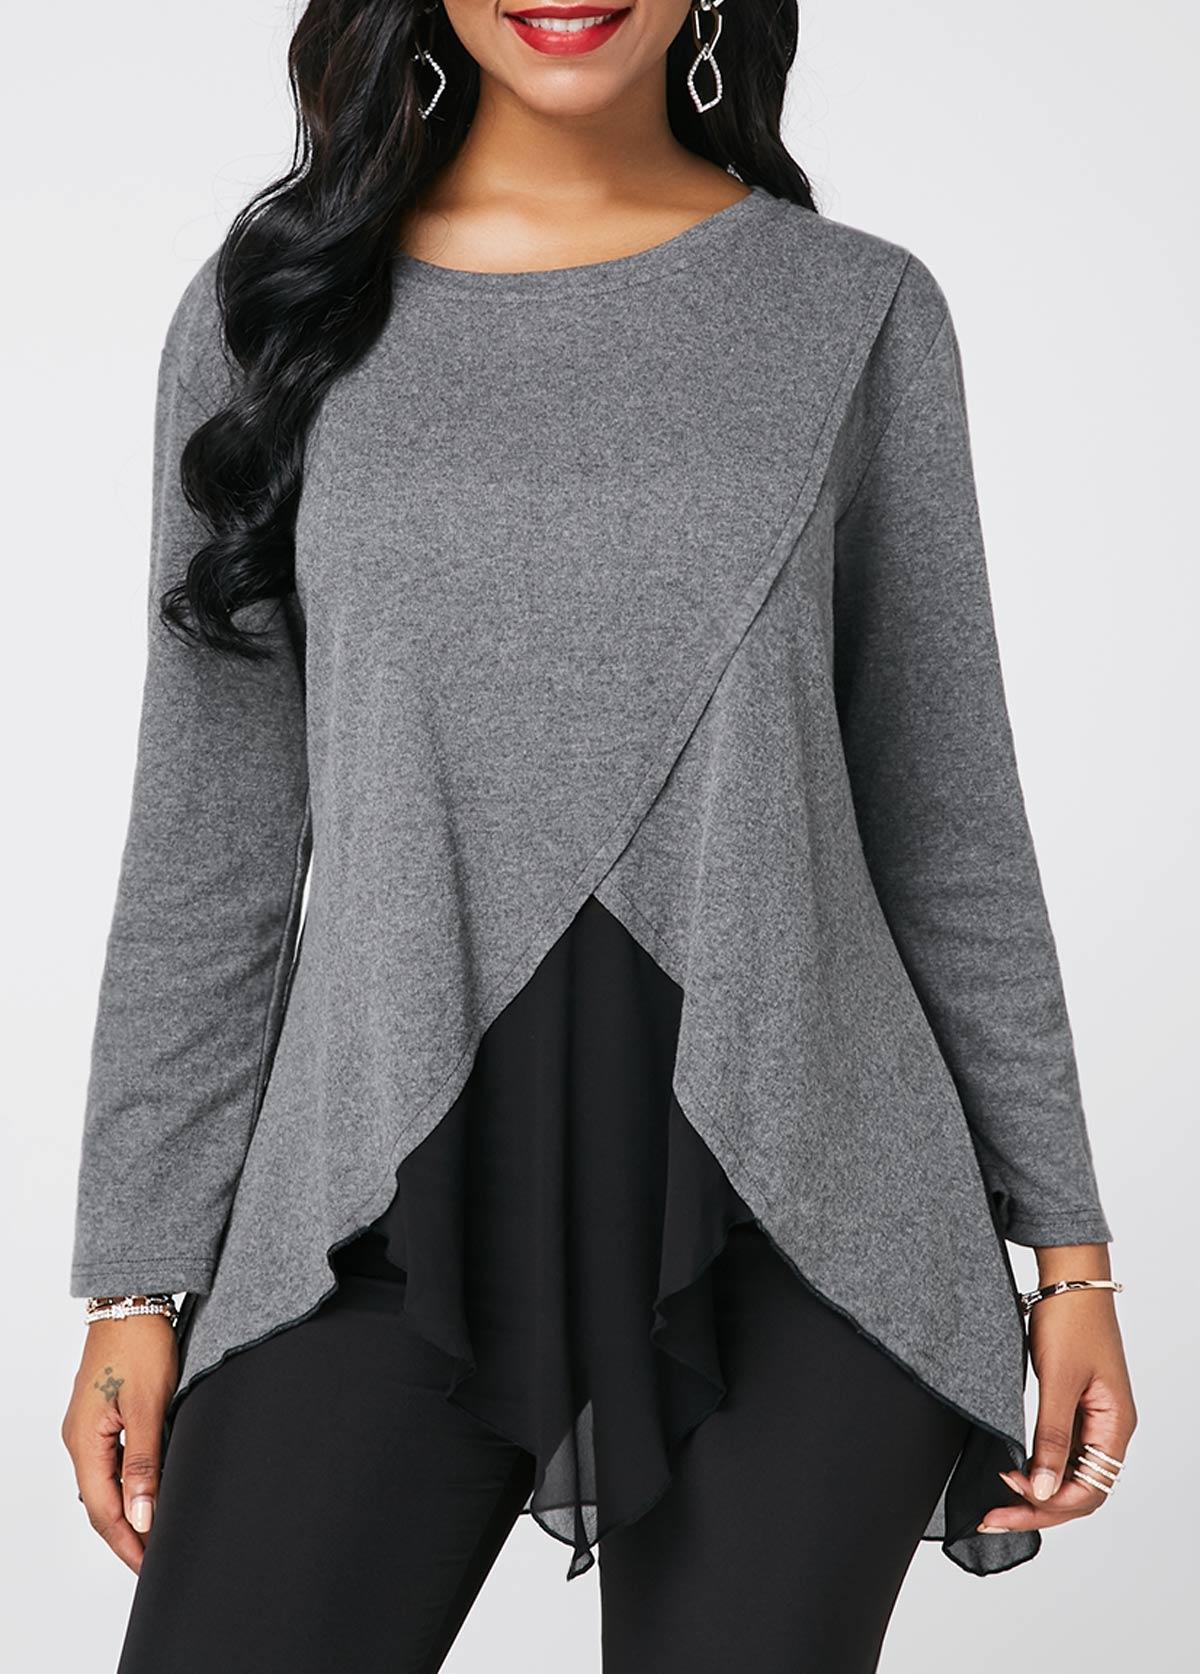 Long Sleeve Chiffon Patchwork Light Grey Blouse